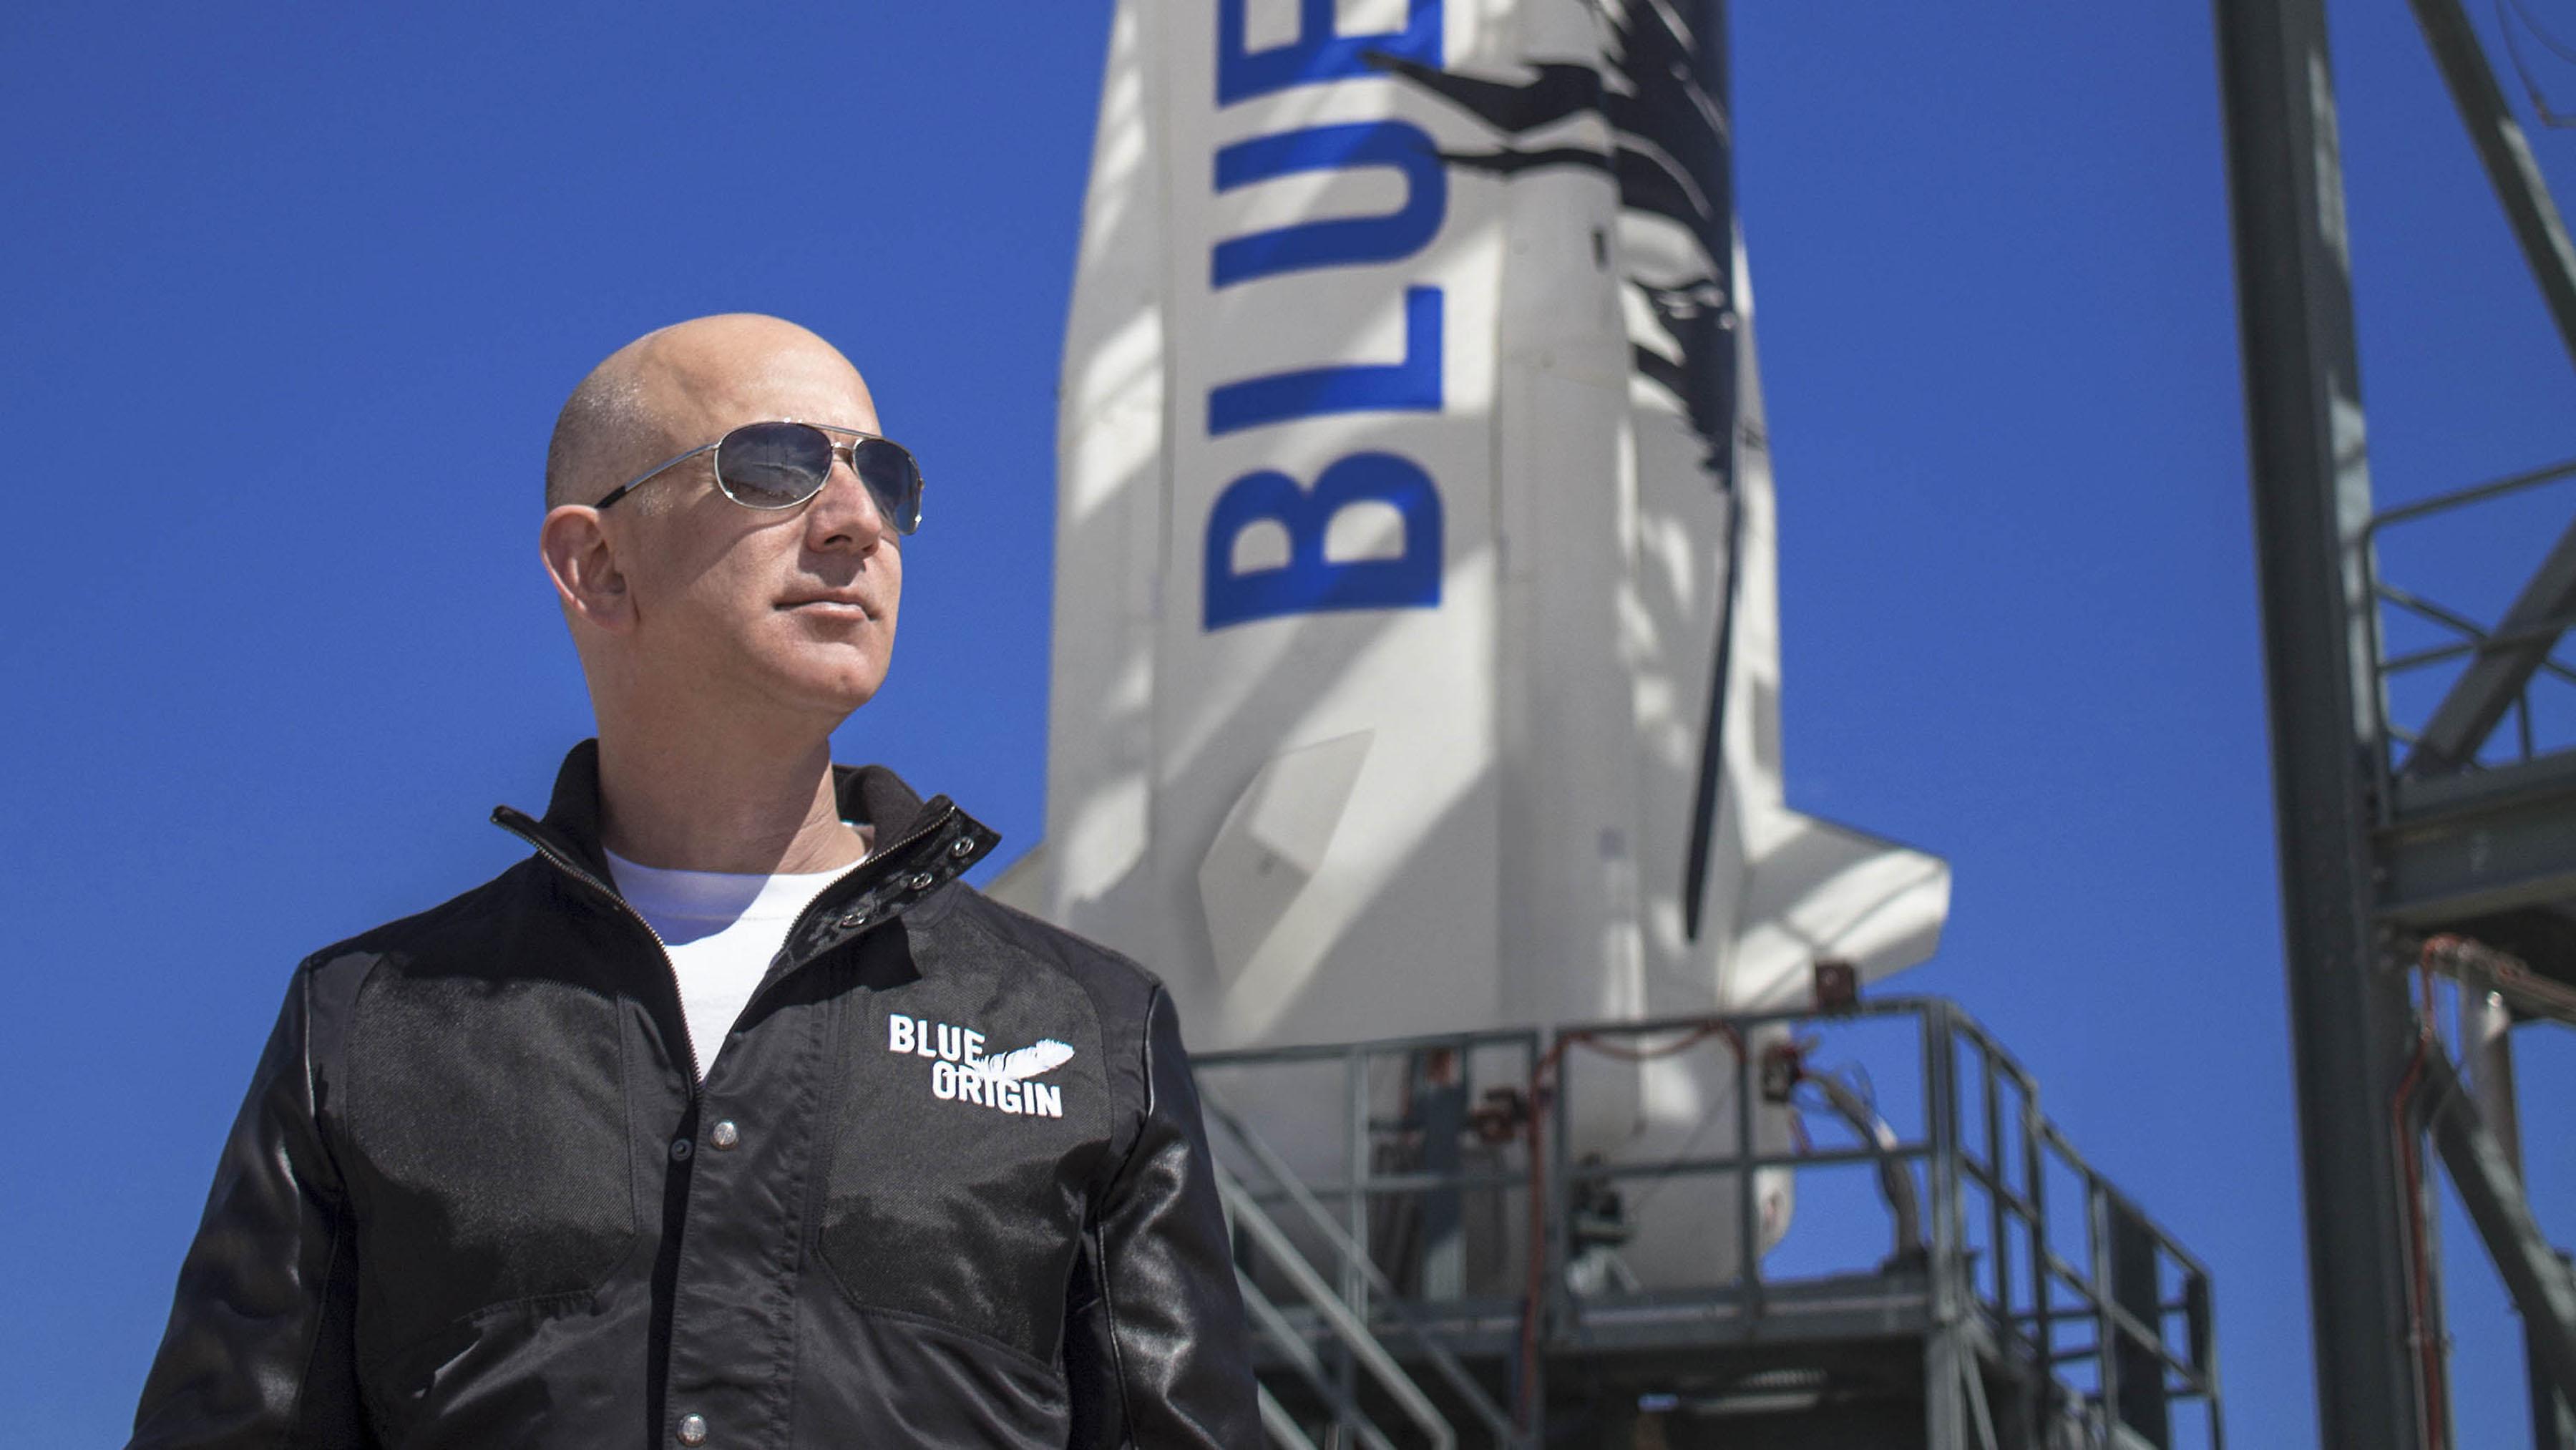 Cara menyaksikan pendiri Amazon Jeff Bezos terbang ke luar angkasa minggu depan — BGR